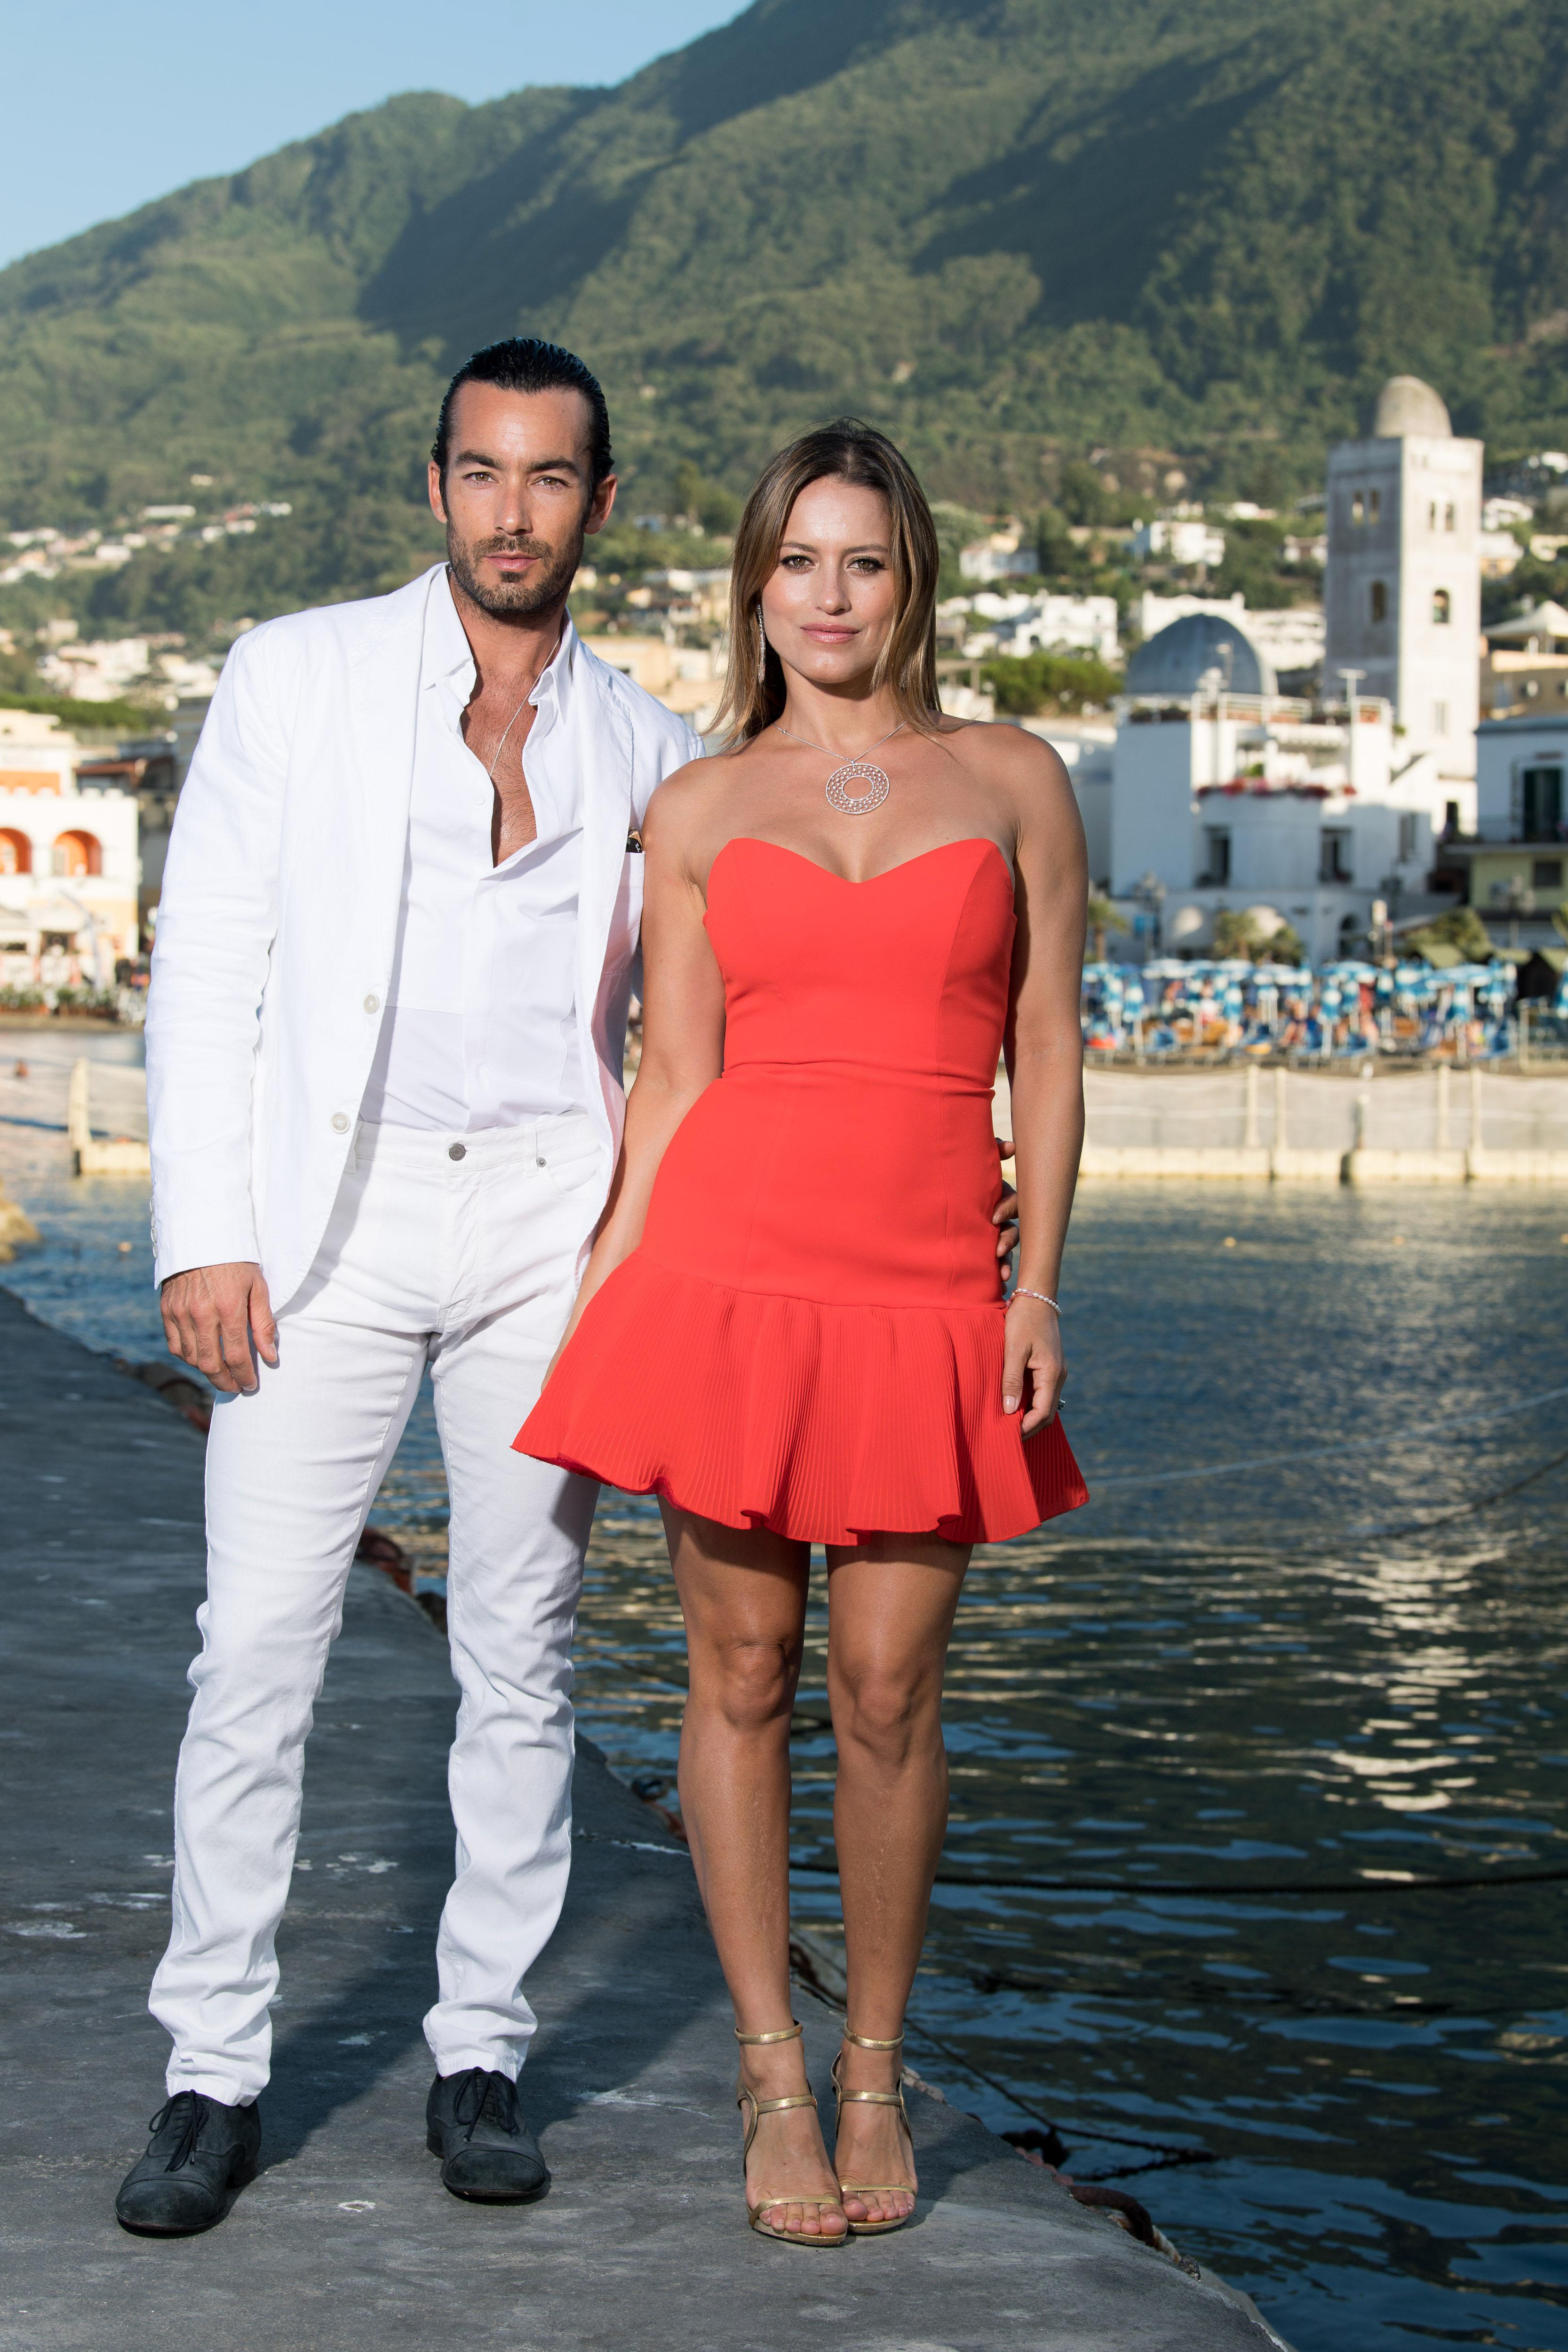 Aaron Diaz y Lola Ponce